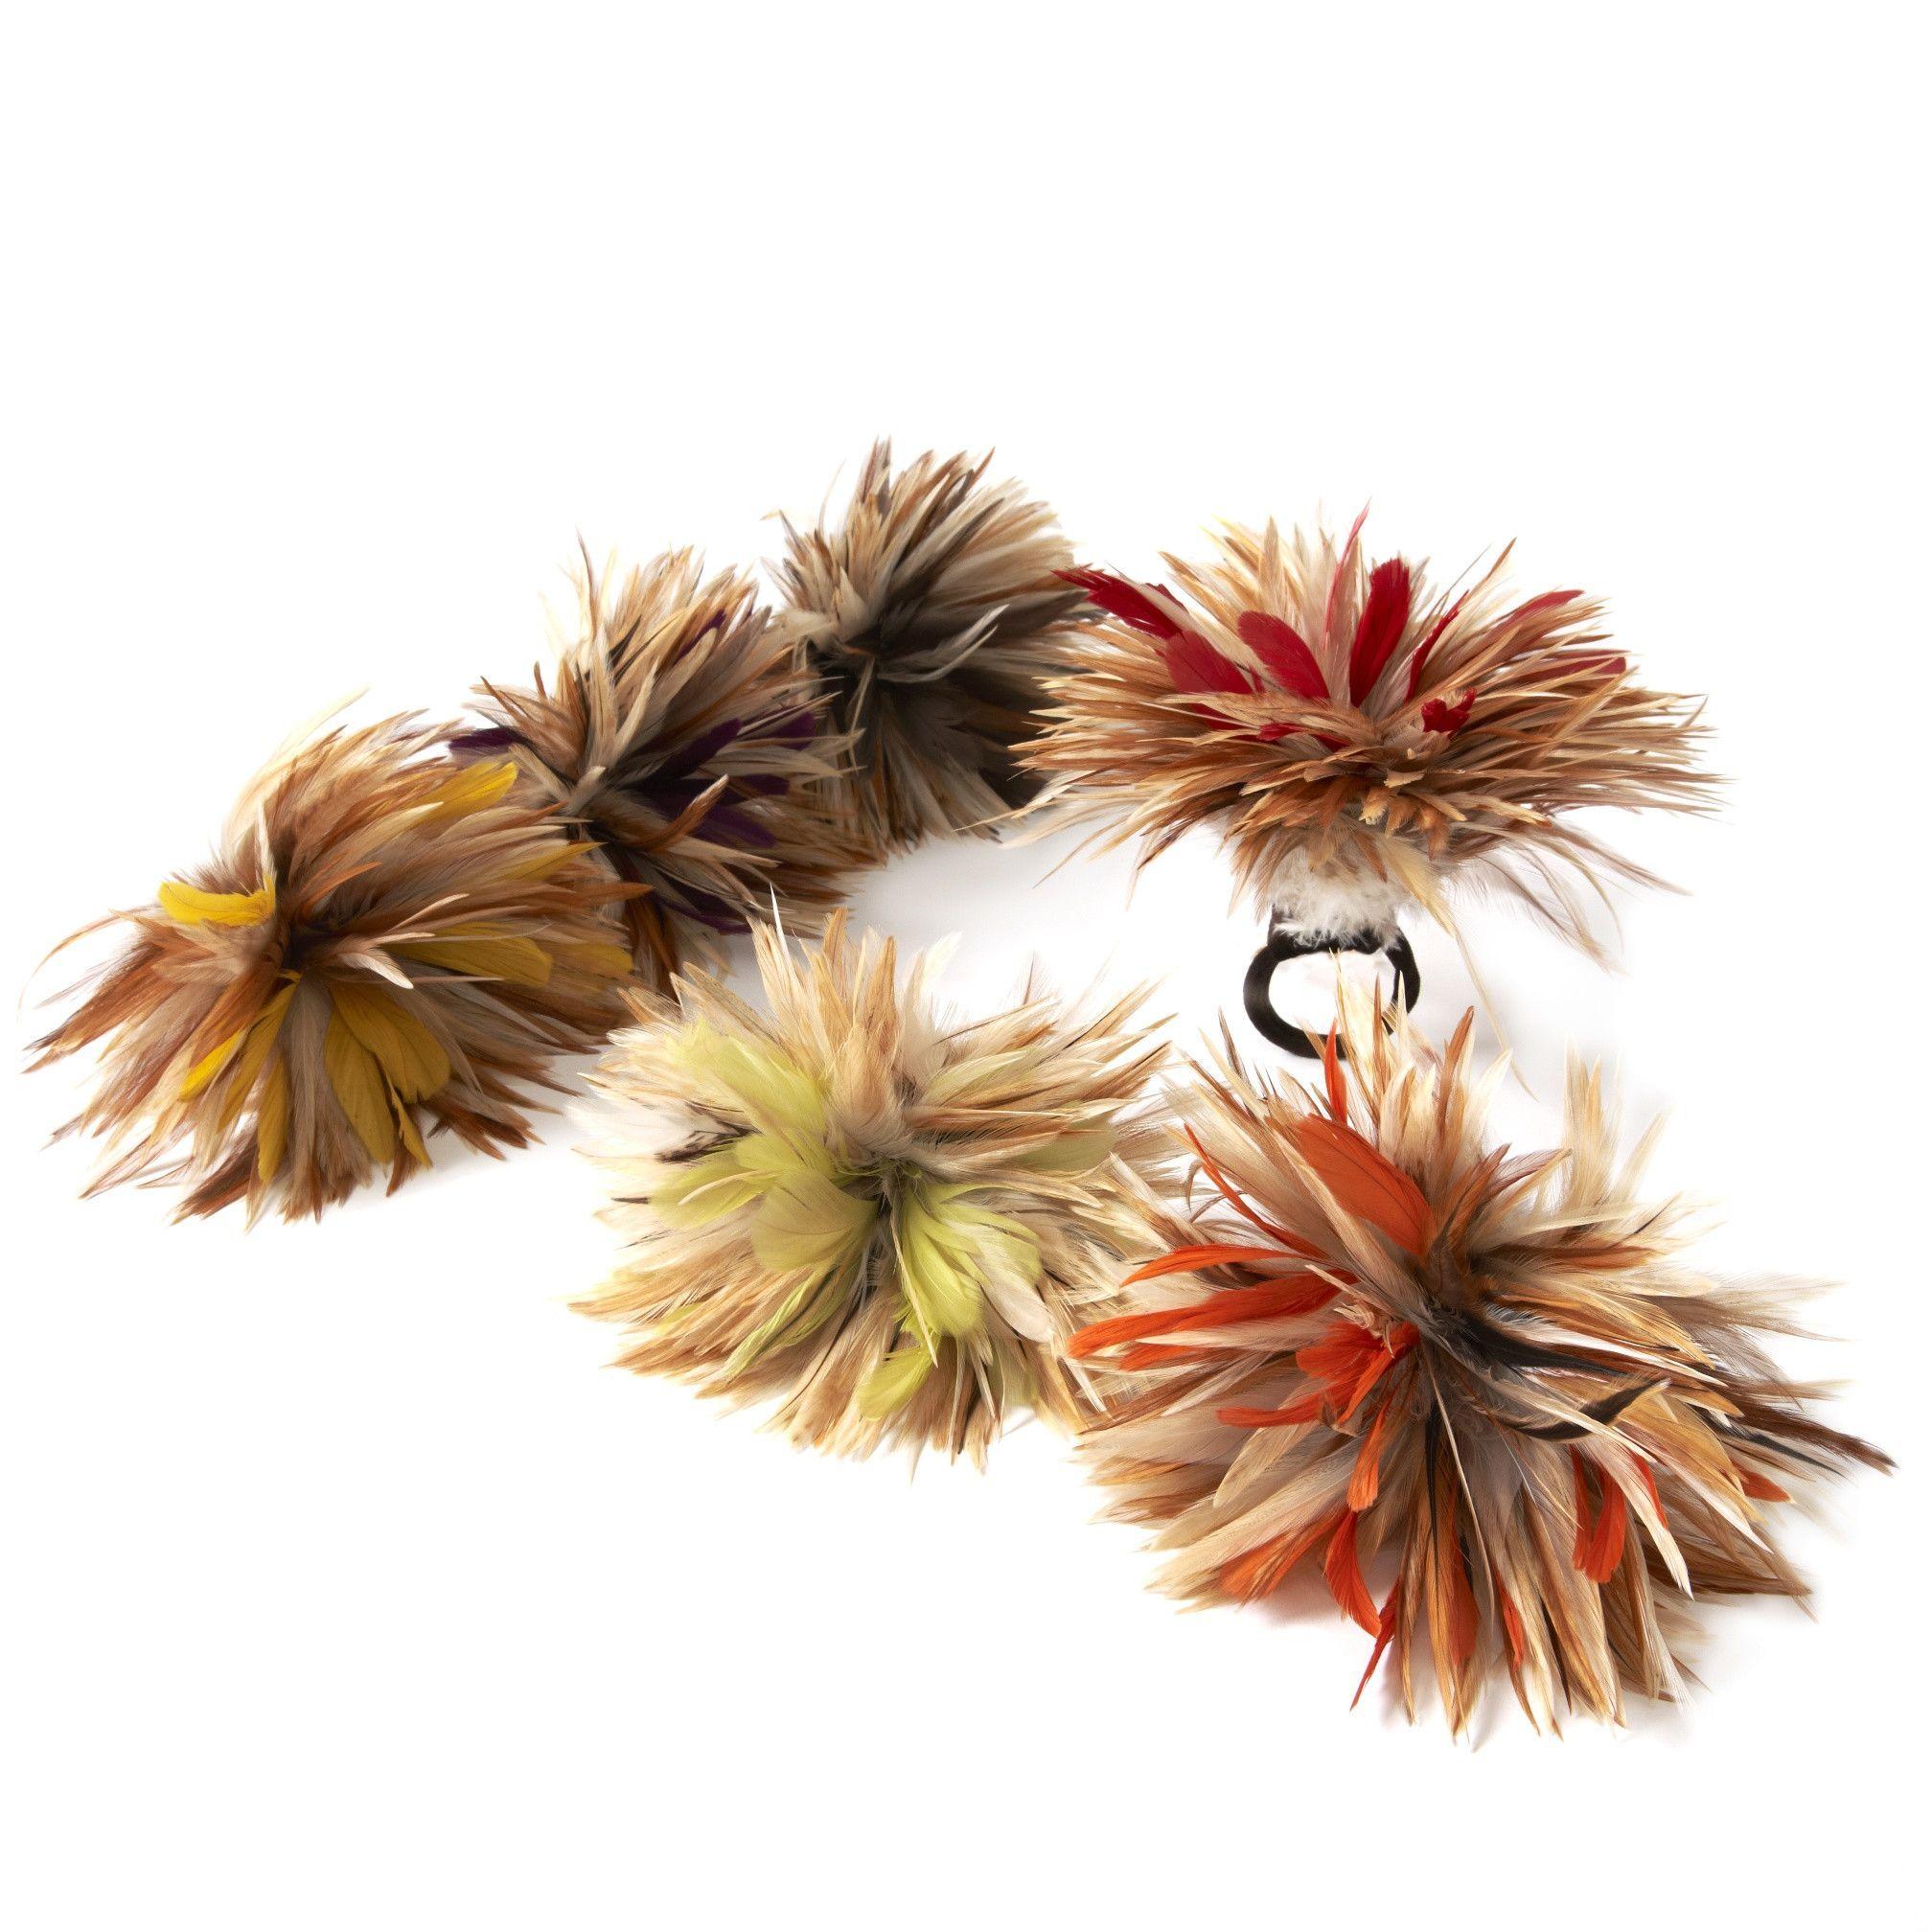 Deborah Rhodes Cream Autumn Feather Flower Napkin Ring - Set of 6